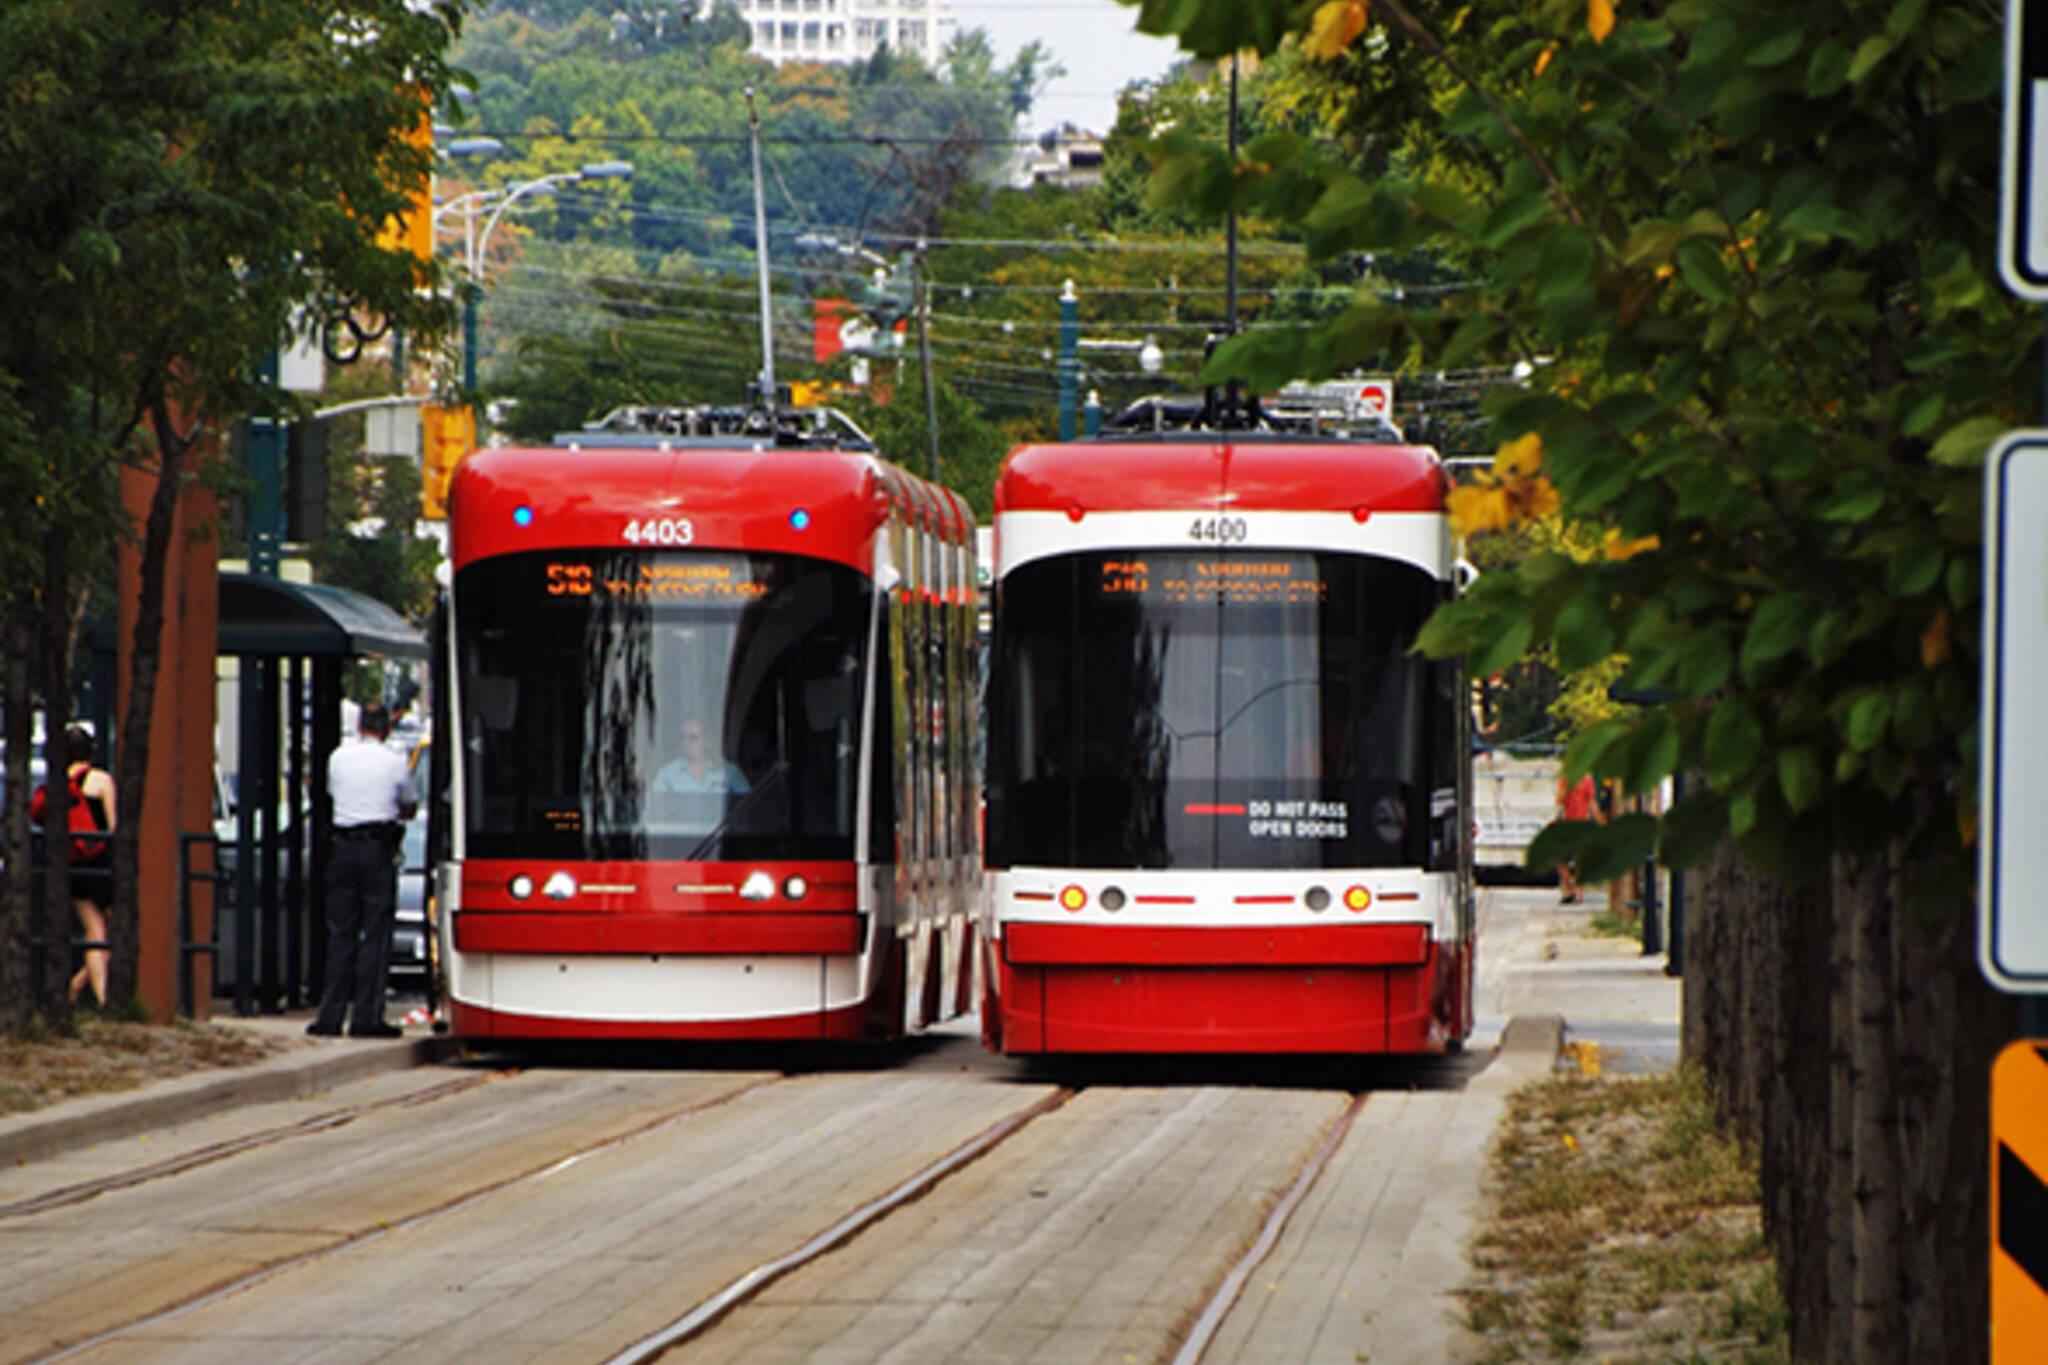 new streetcar ttc toronto